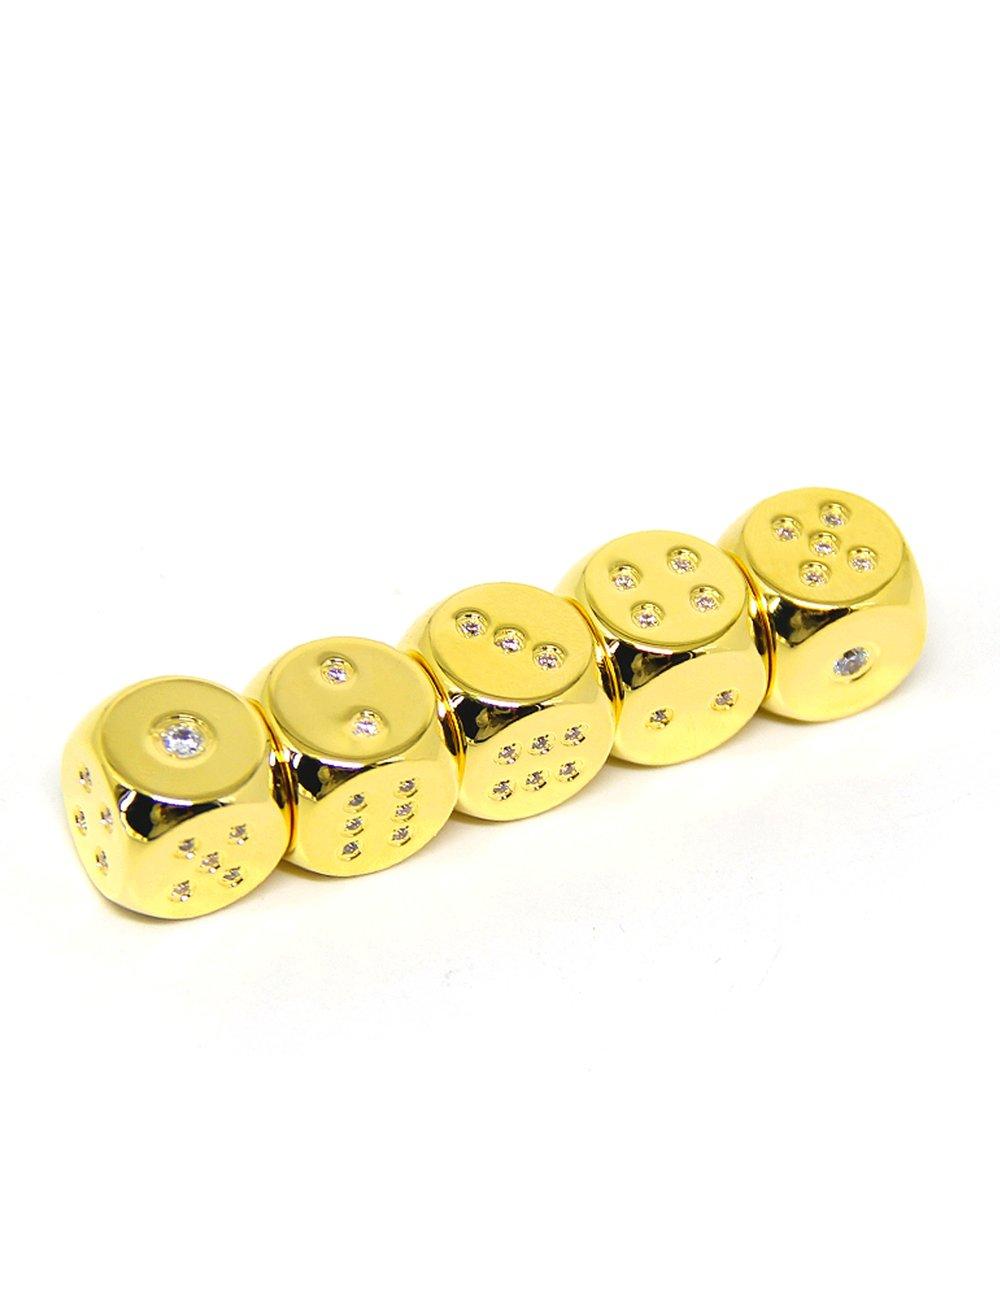 Callancity 4pcs handwork rhinestone diamonds encrusted 24kt real gold plated game custom dice